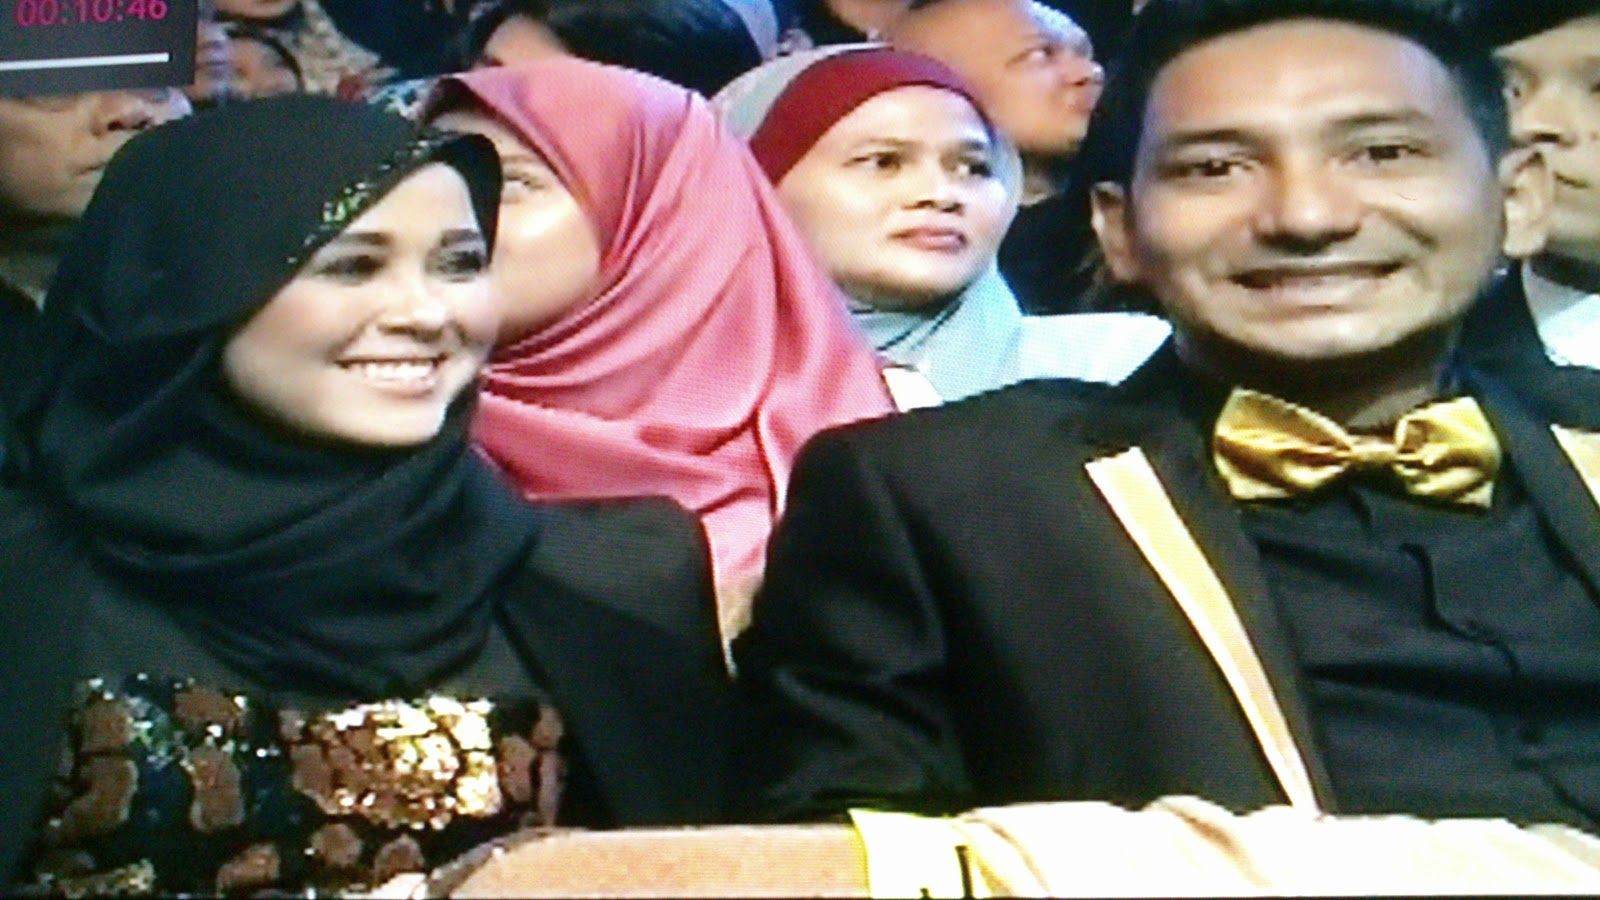 Anugerah Skrin 2014 : Emma Maembong dan Zizan Razak